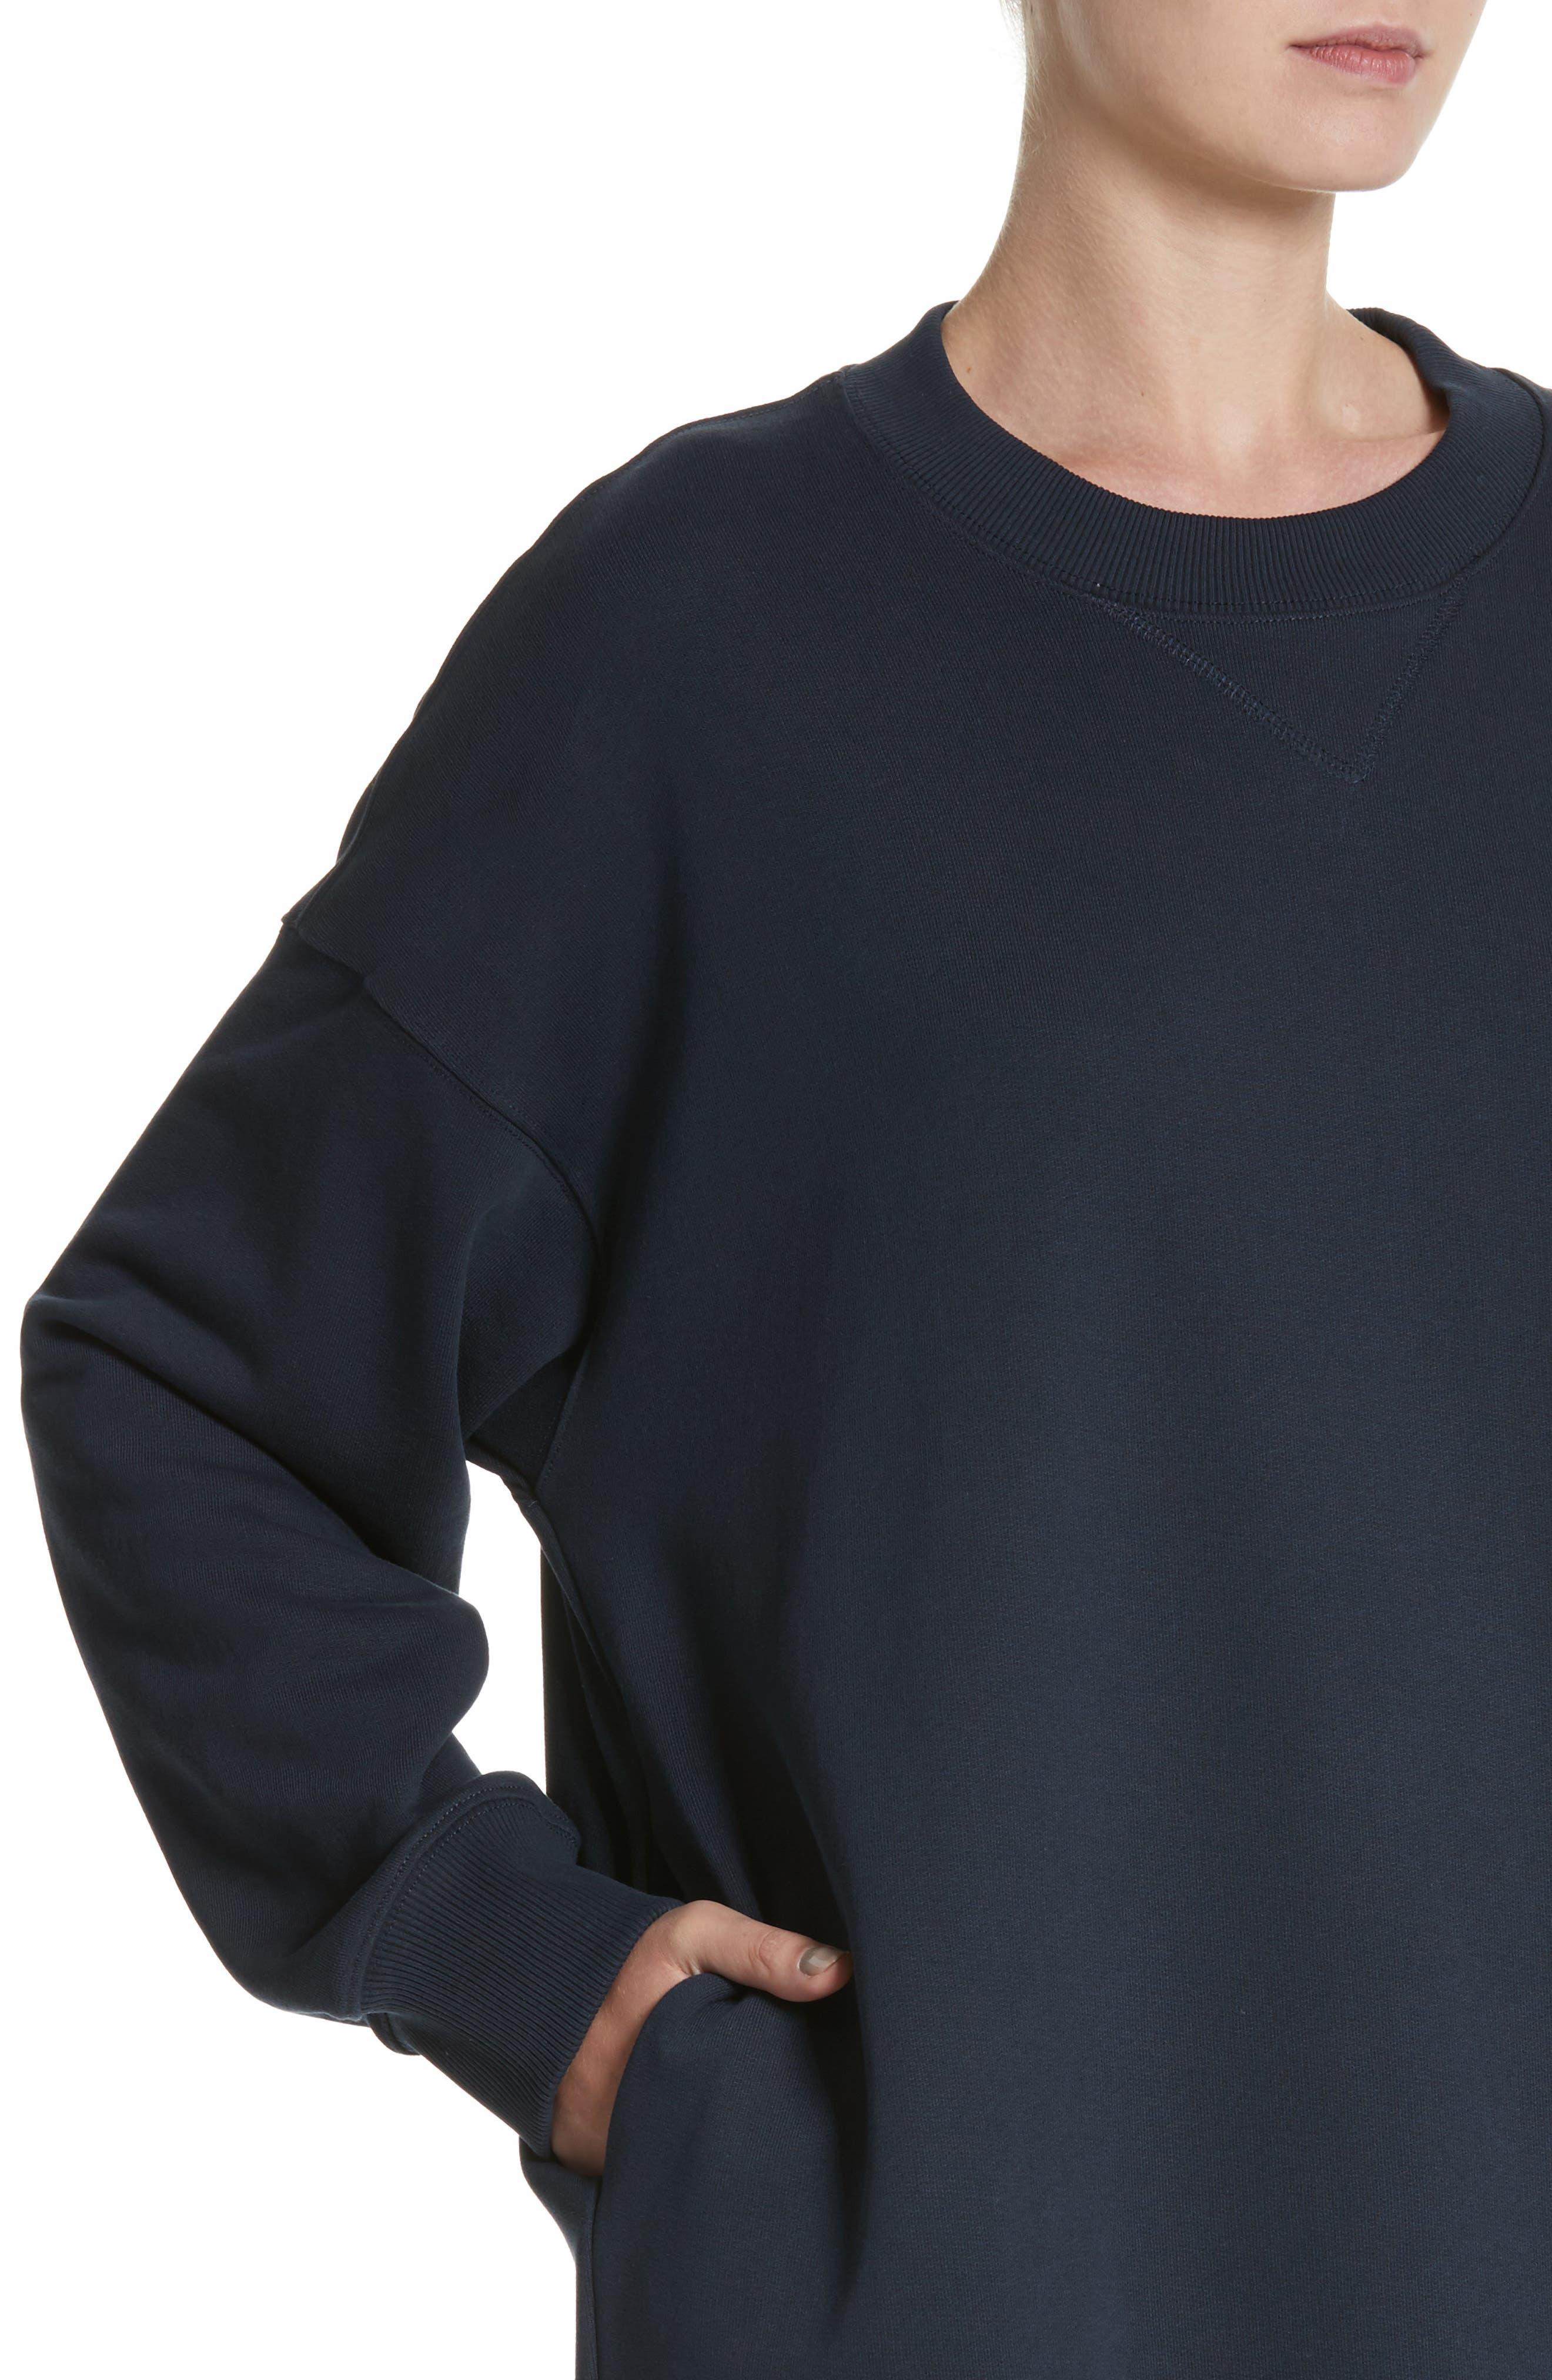 Sweatshirt Dress,                             Alternate thumbnail 4, color,                             Navy